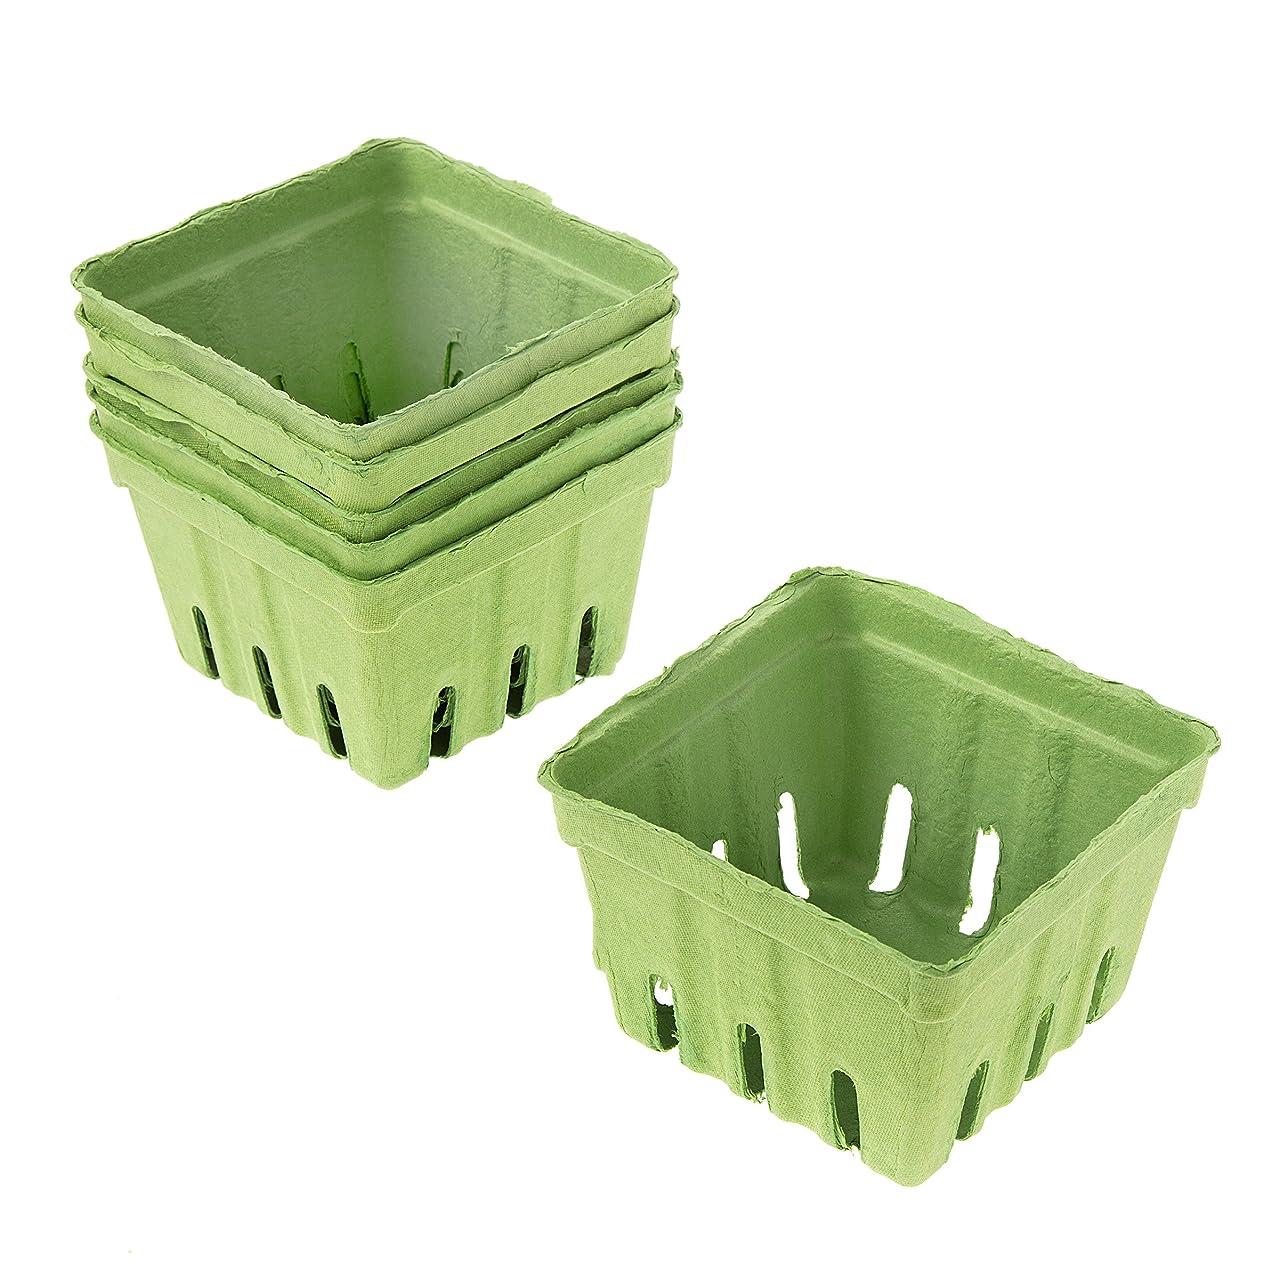 Darice Green Paper Berry Basket, 6 Piece